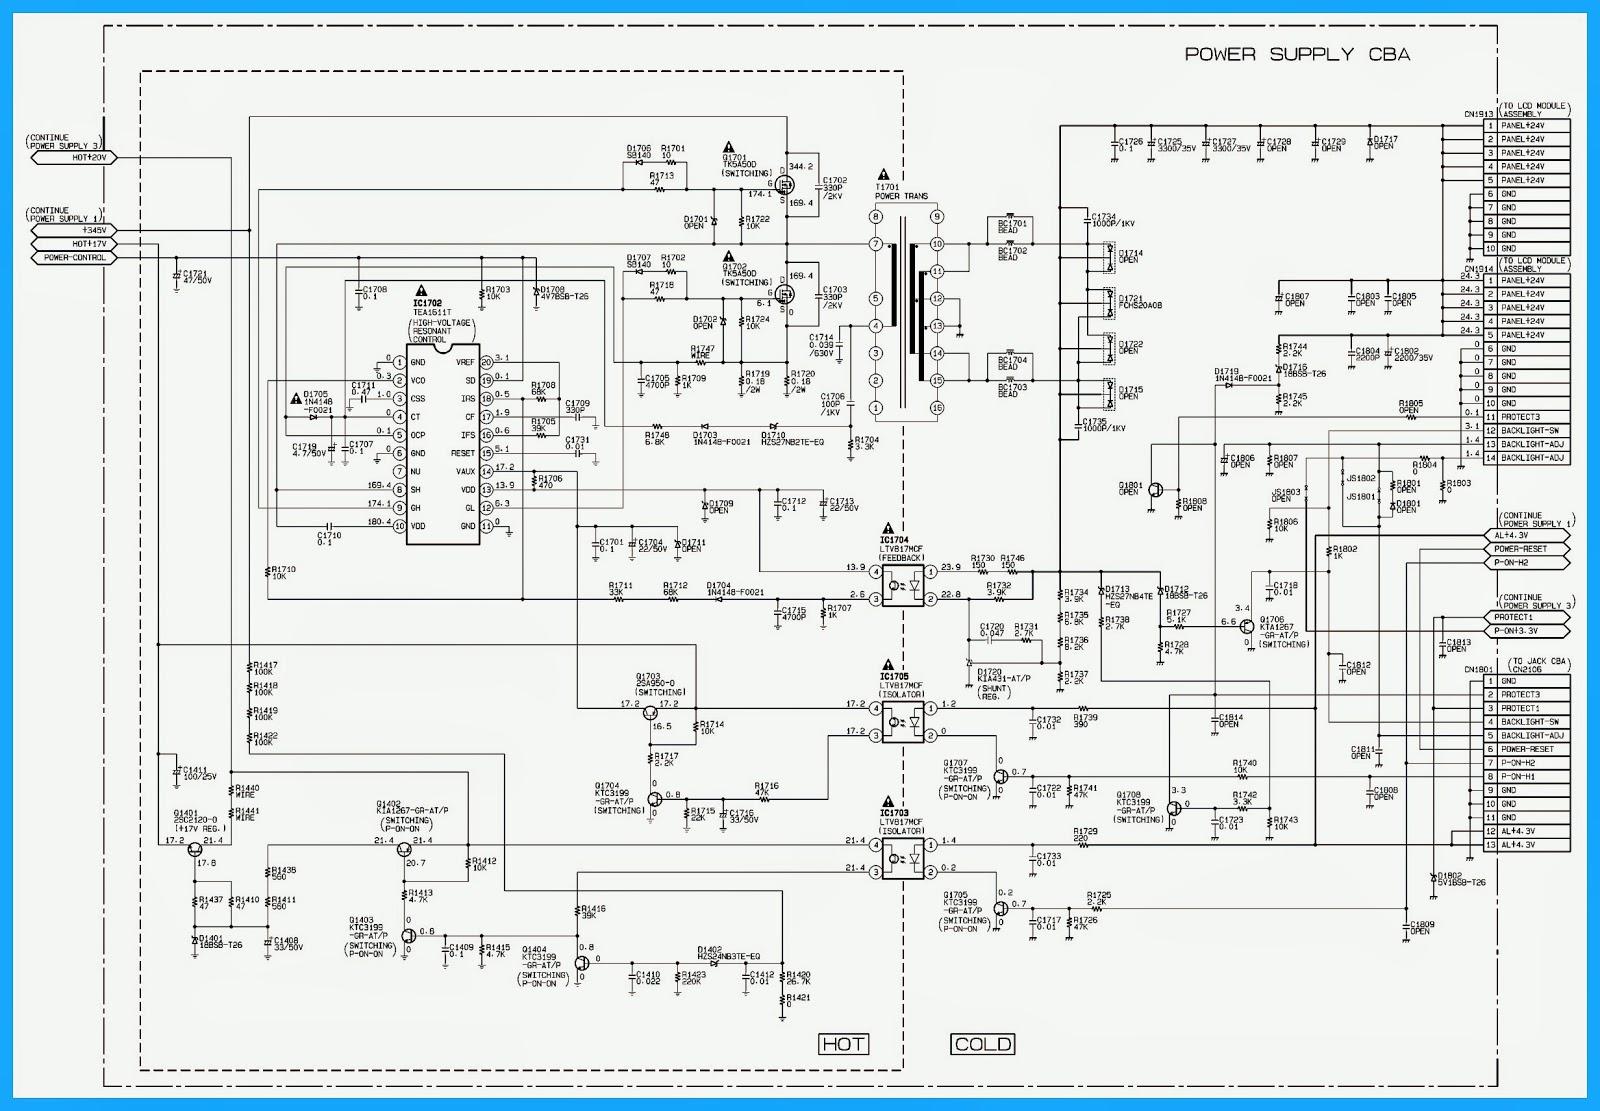 schematic diagram for emerson tvs emerson appliances emerson tv input emerson tv remote [ 1600 x 1111 Pixel ]